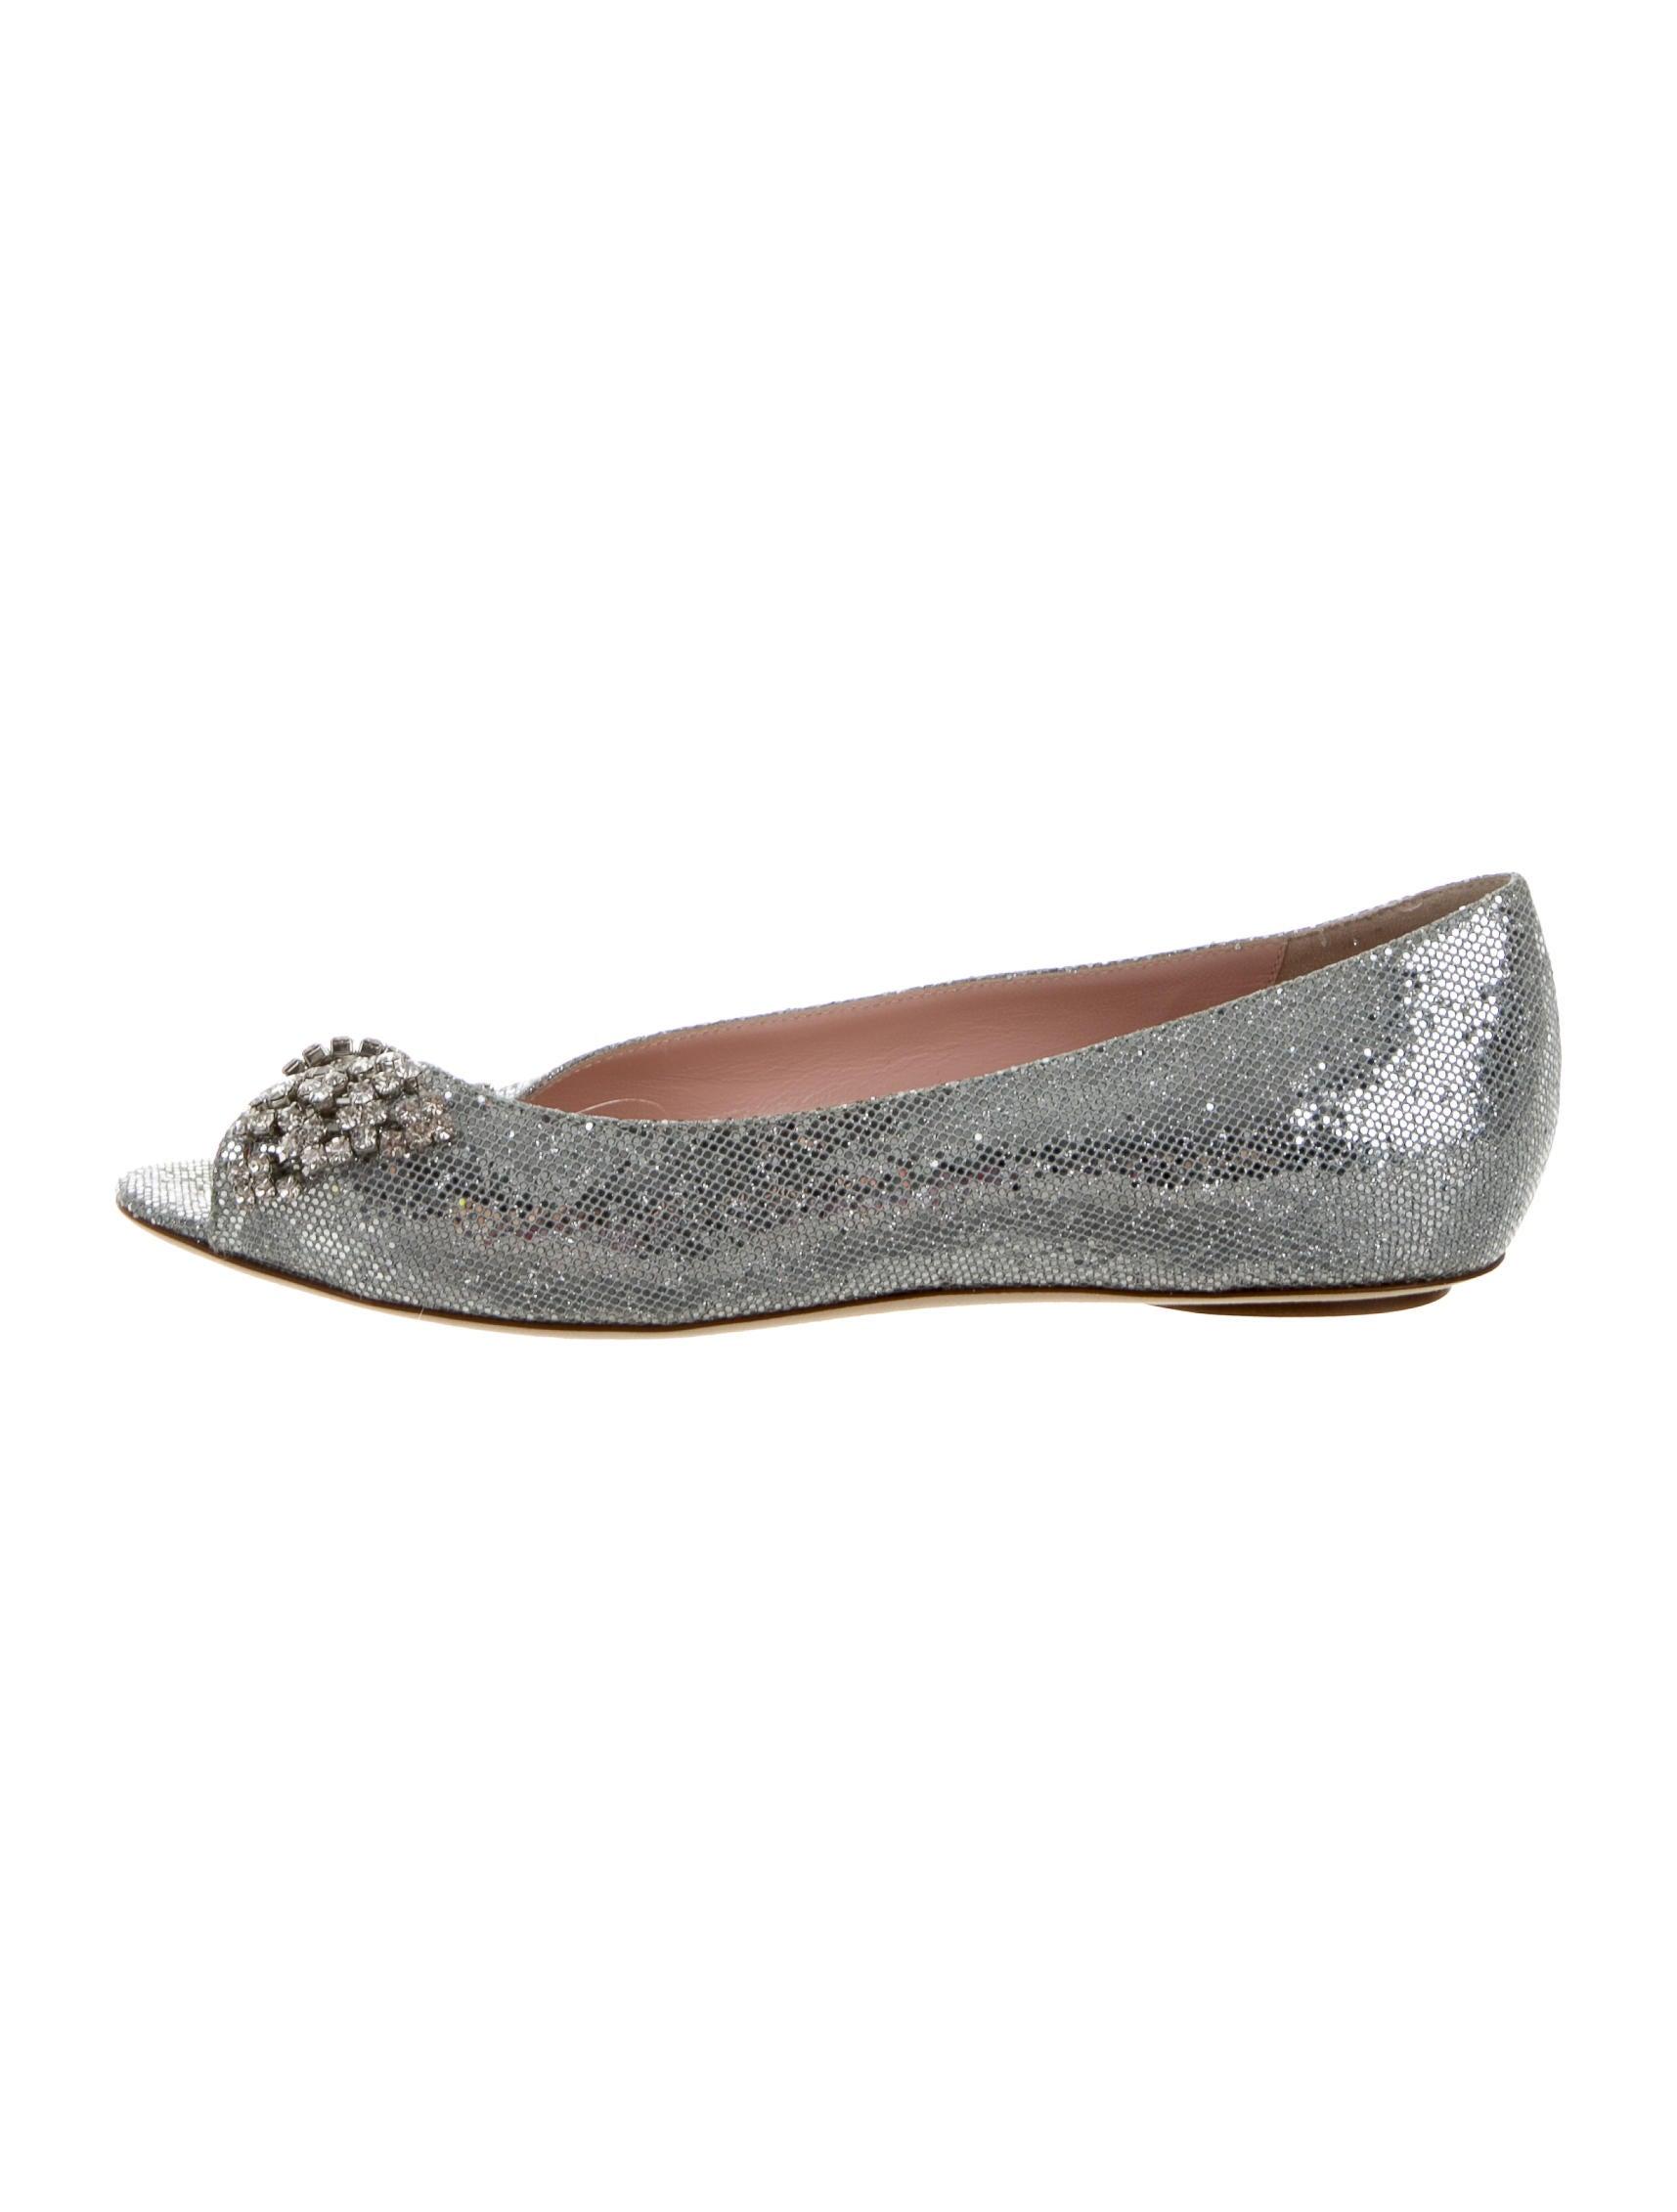 Kate spade new york metallic peep toe flats shoes for Kate spade new york flats